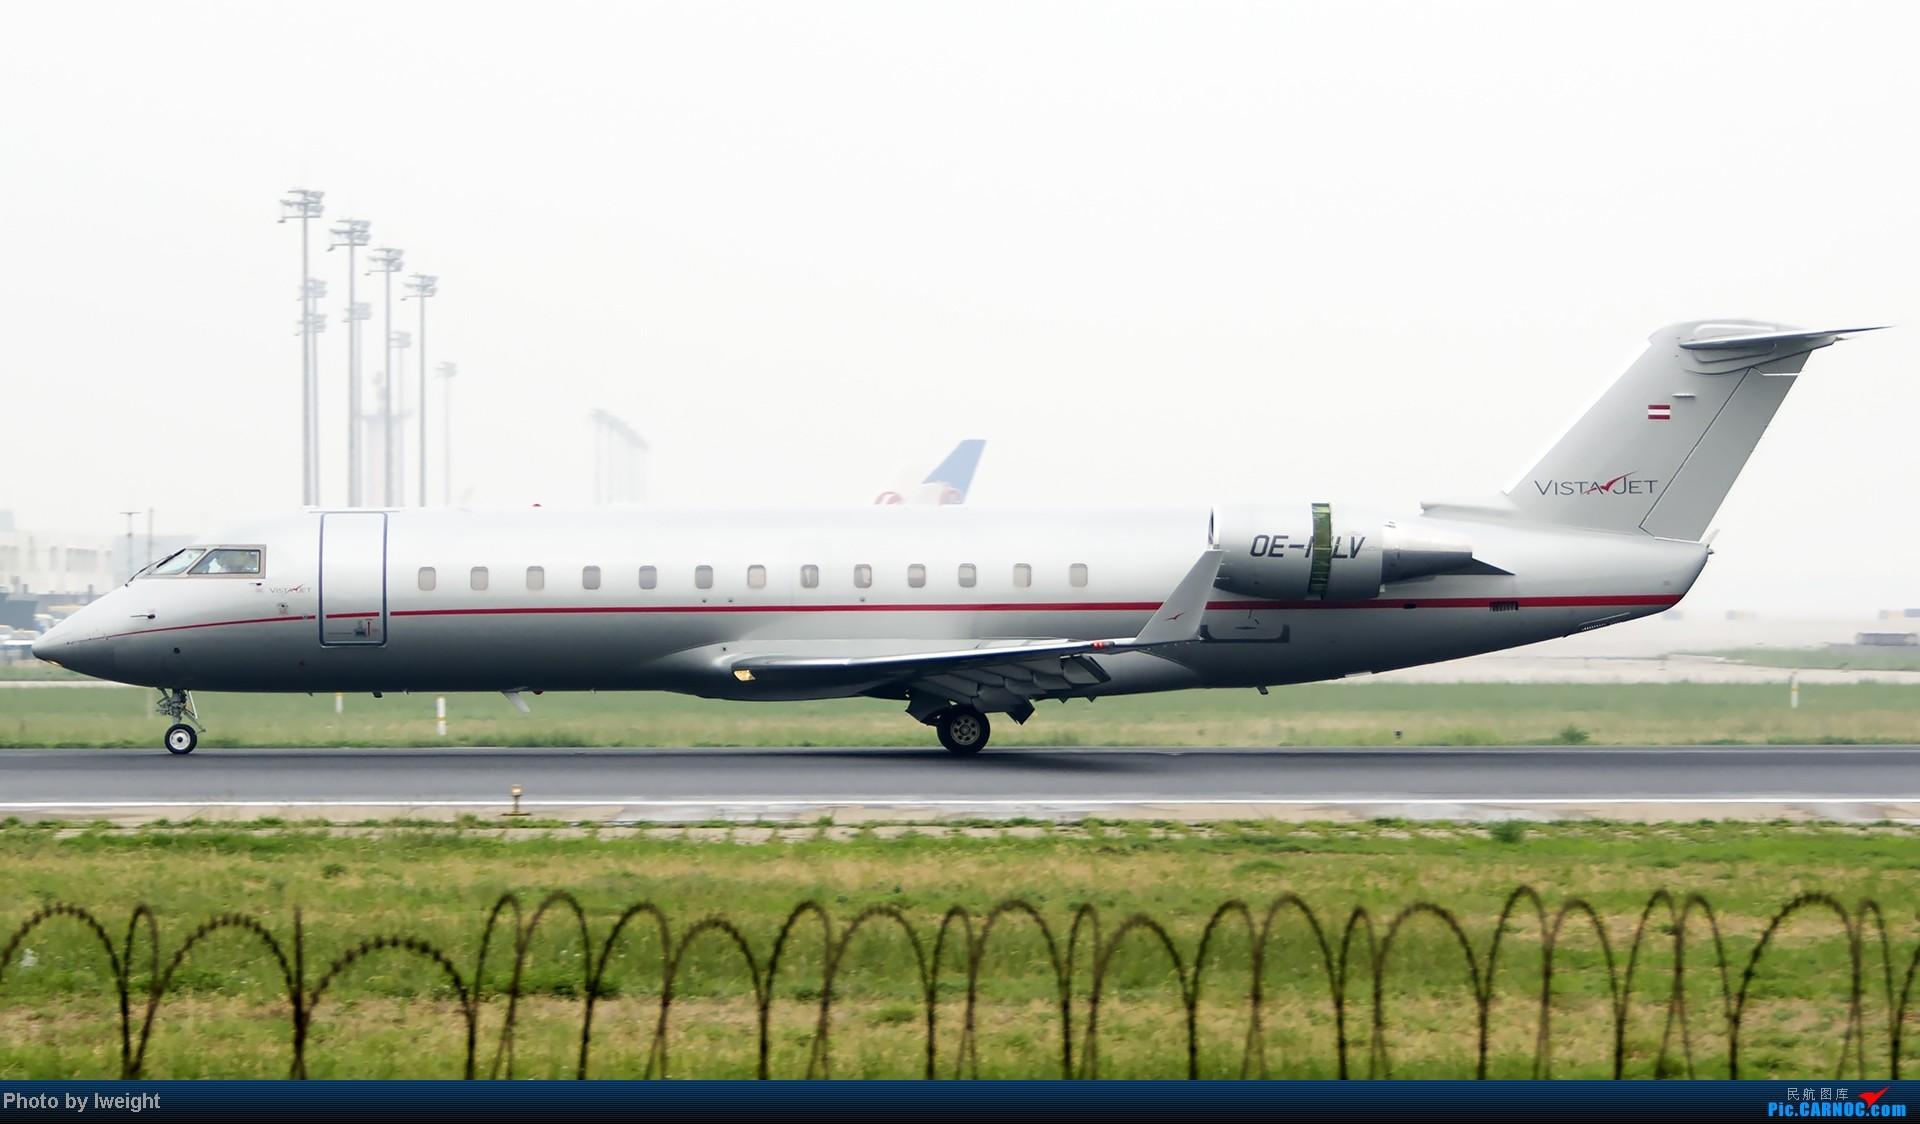 Re:[原创]休假无聊,跑道边来拍机玩(晚点的ZestAir、换装的B6100和刚交付的B2738等) CANADAIR CL-600-2B19 CHALLENGER 850 OE-ILV 中国北京首都机场